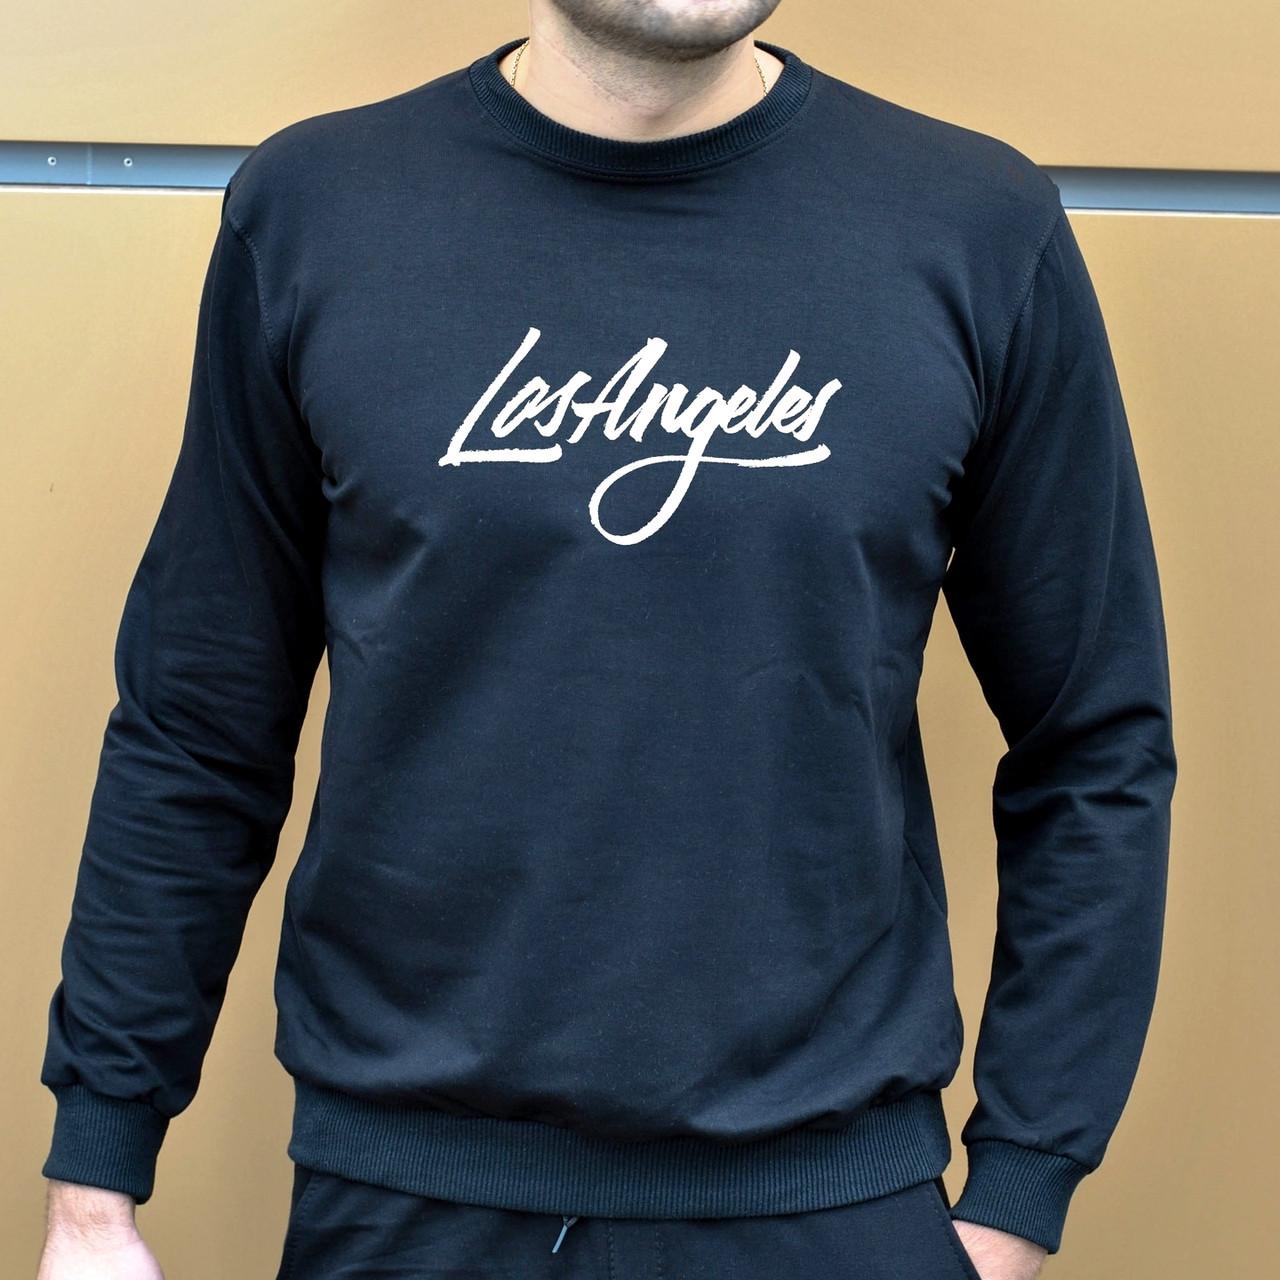 Мужская кофта - Свитшоты Los Angeles черный (утеплен)